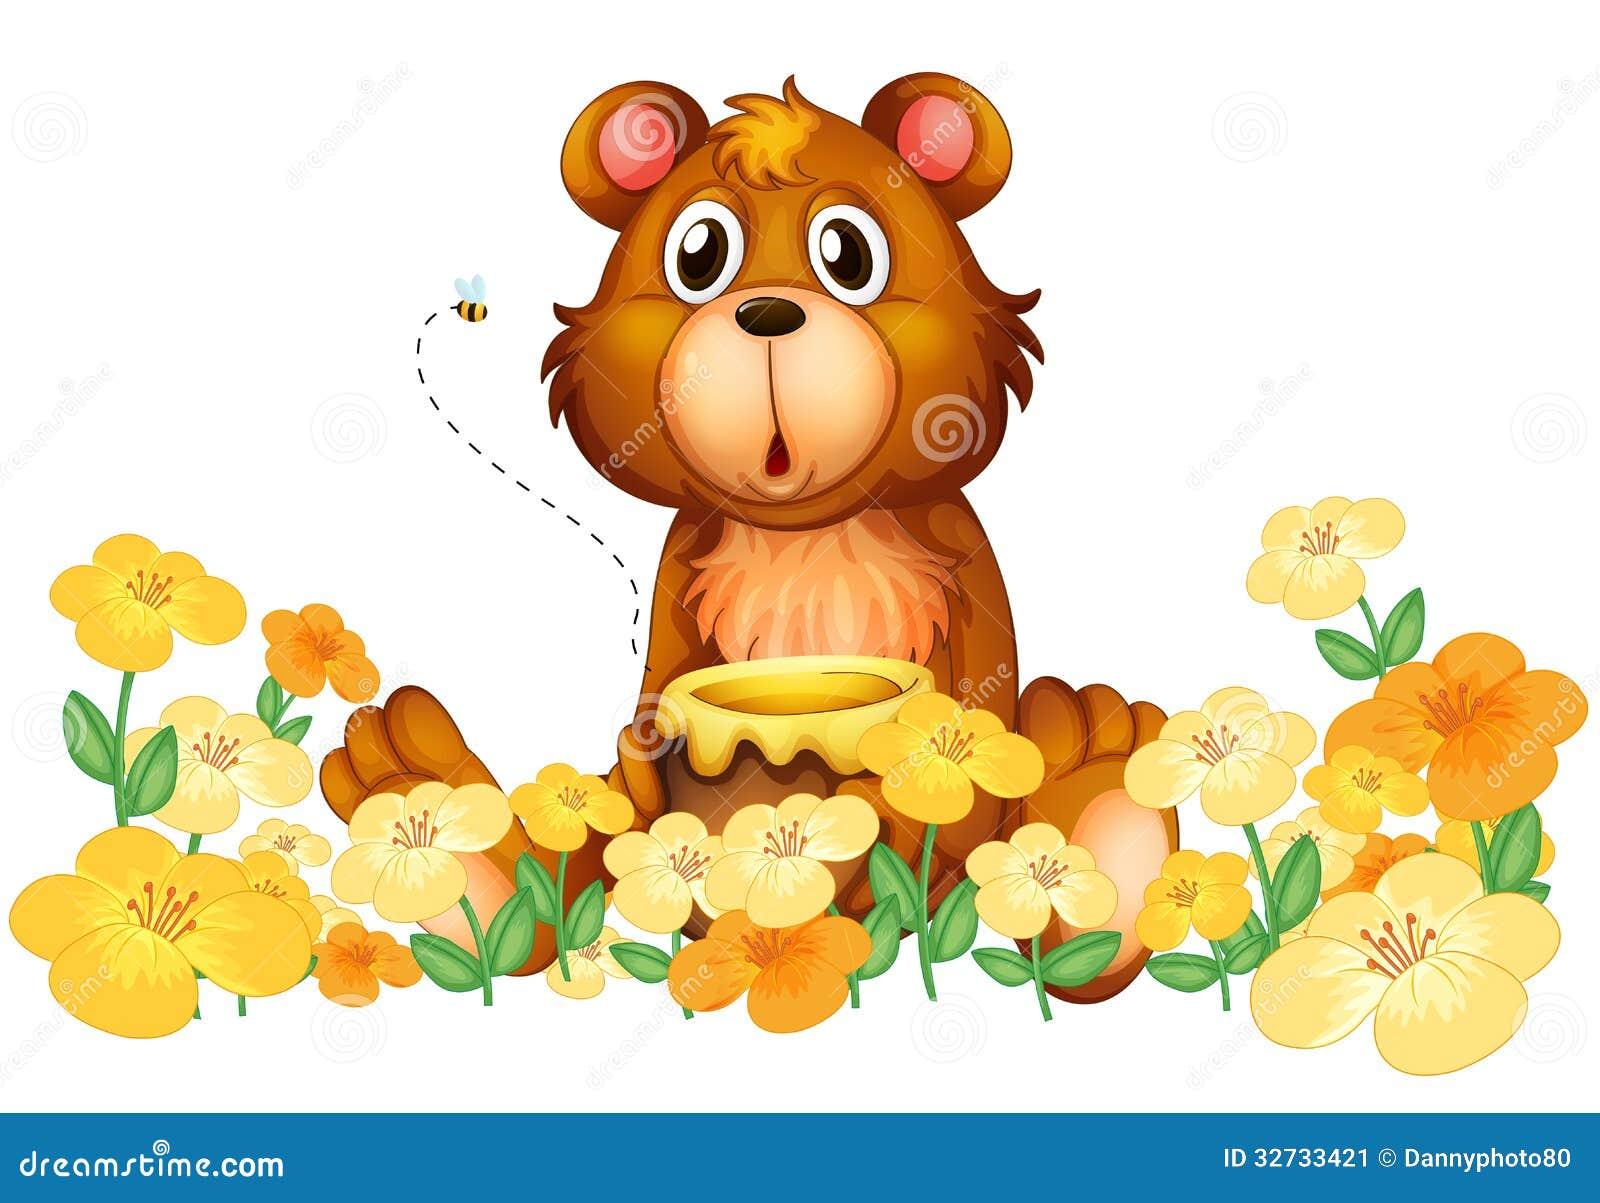 A bear with a honey at the Honey Bear Illustration